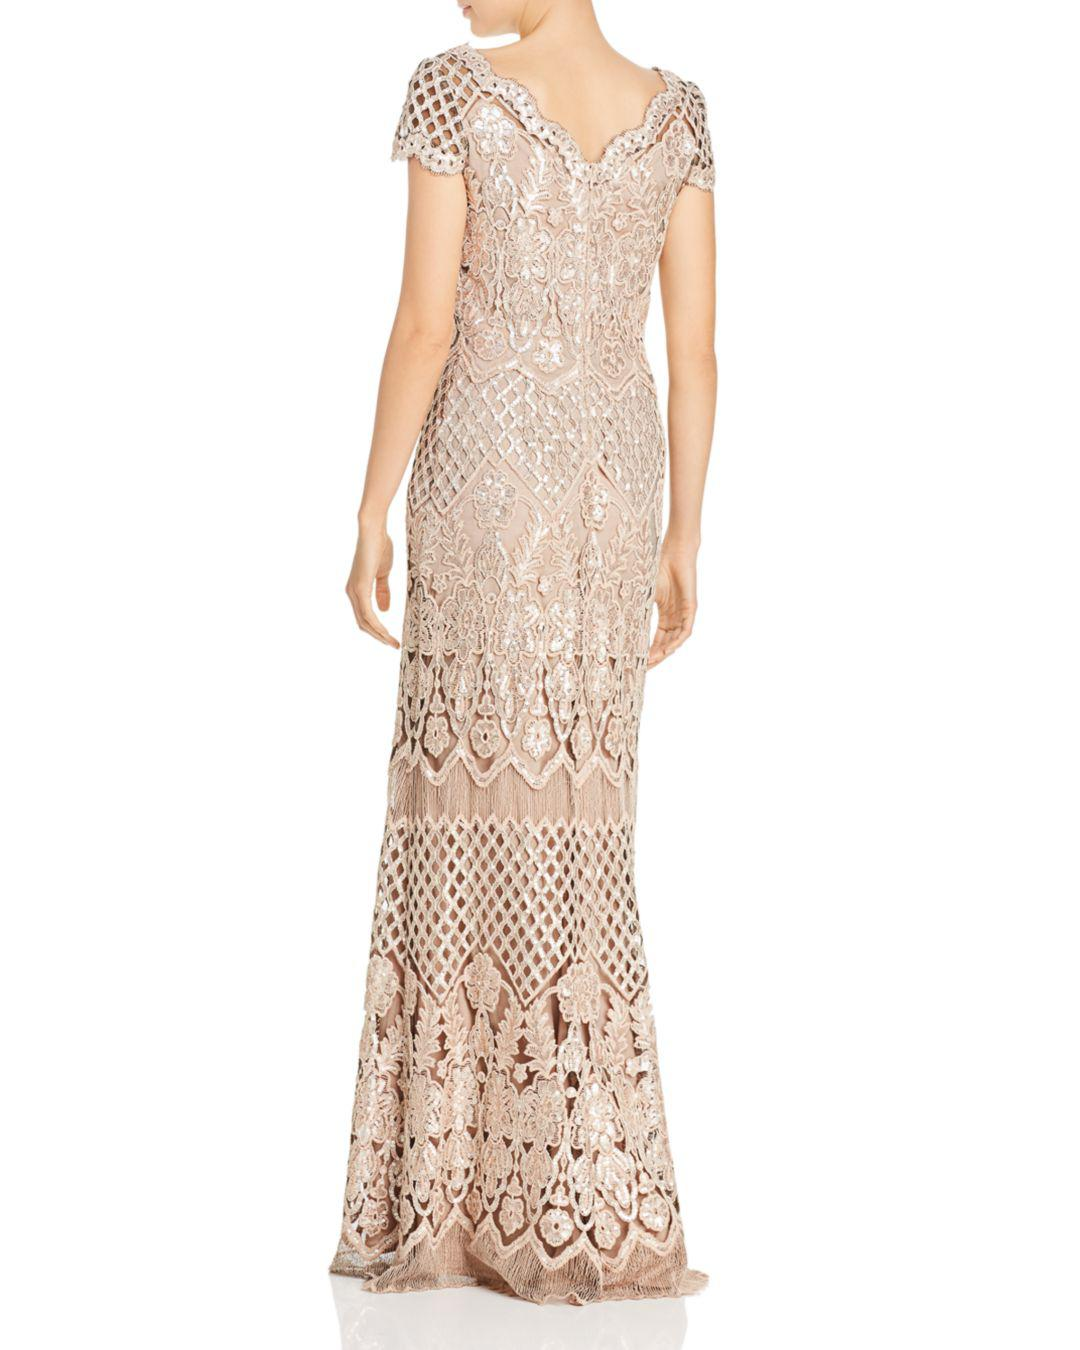 9d6e2dbf090b Lyst - Tadashi Shoji Embroidered Sequin Illusion Gown